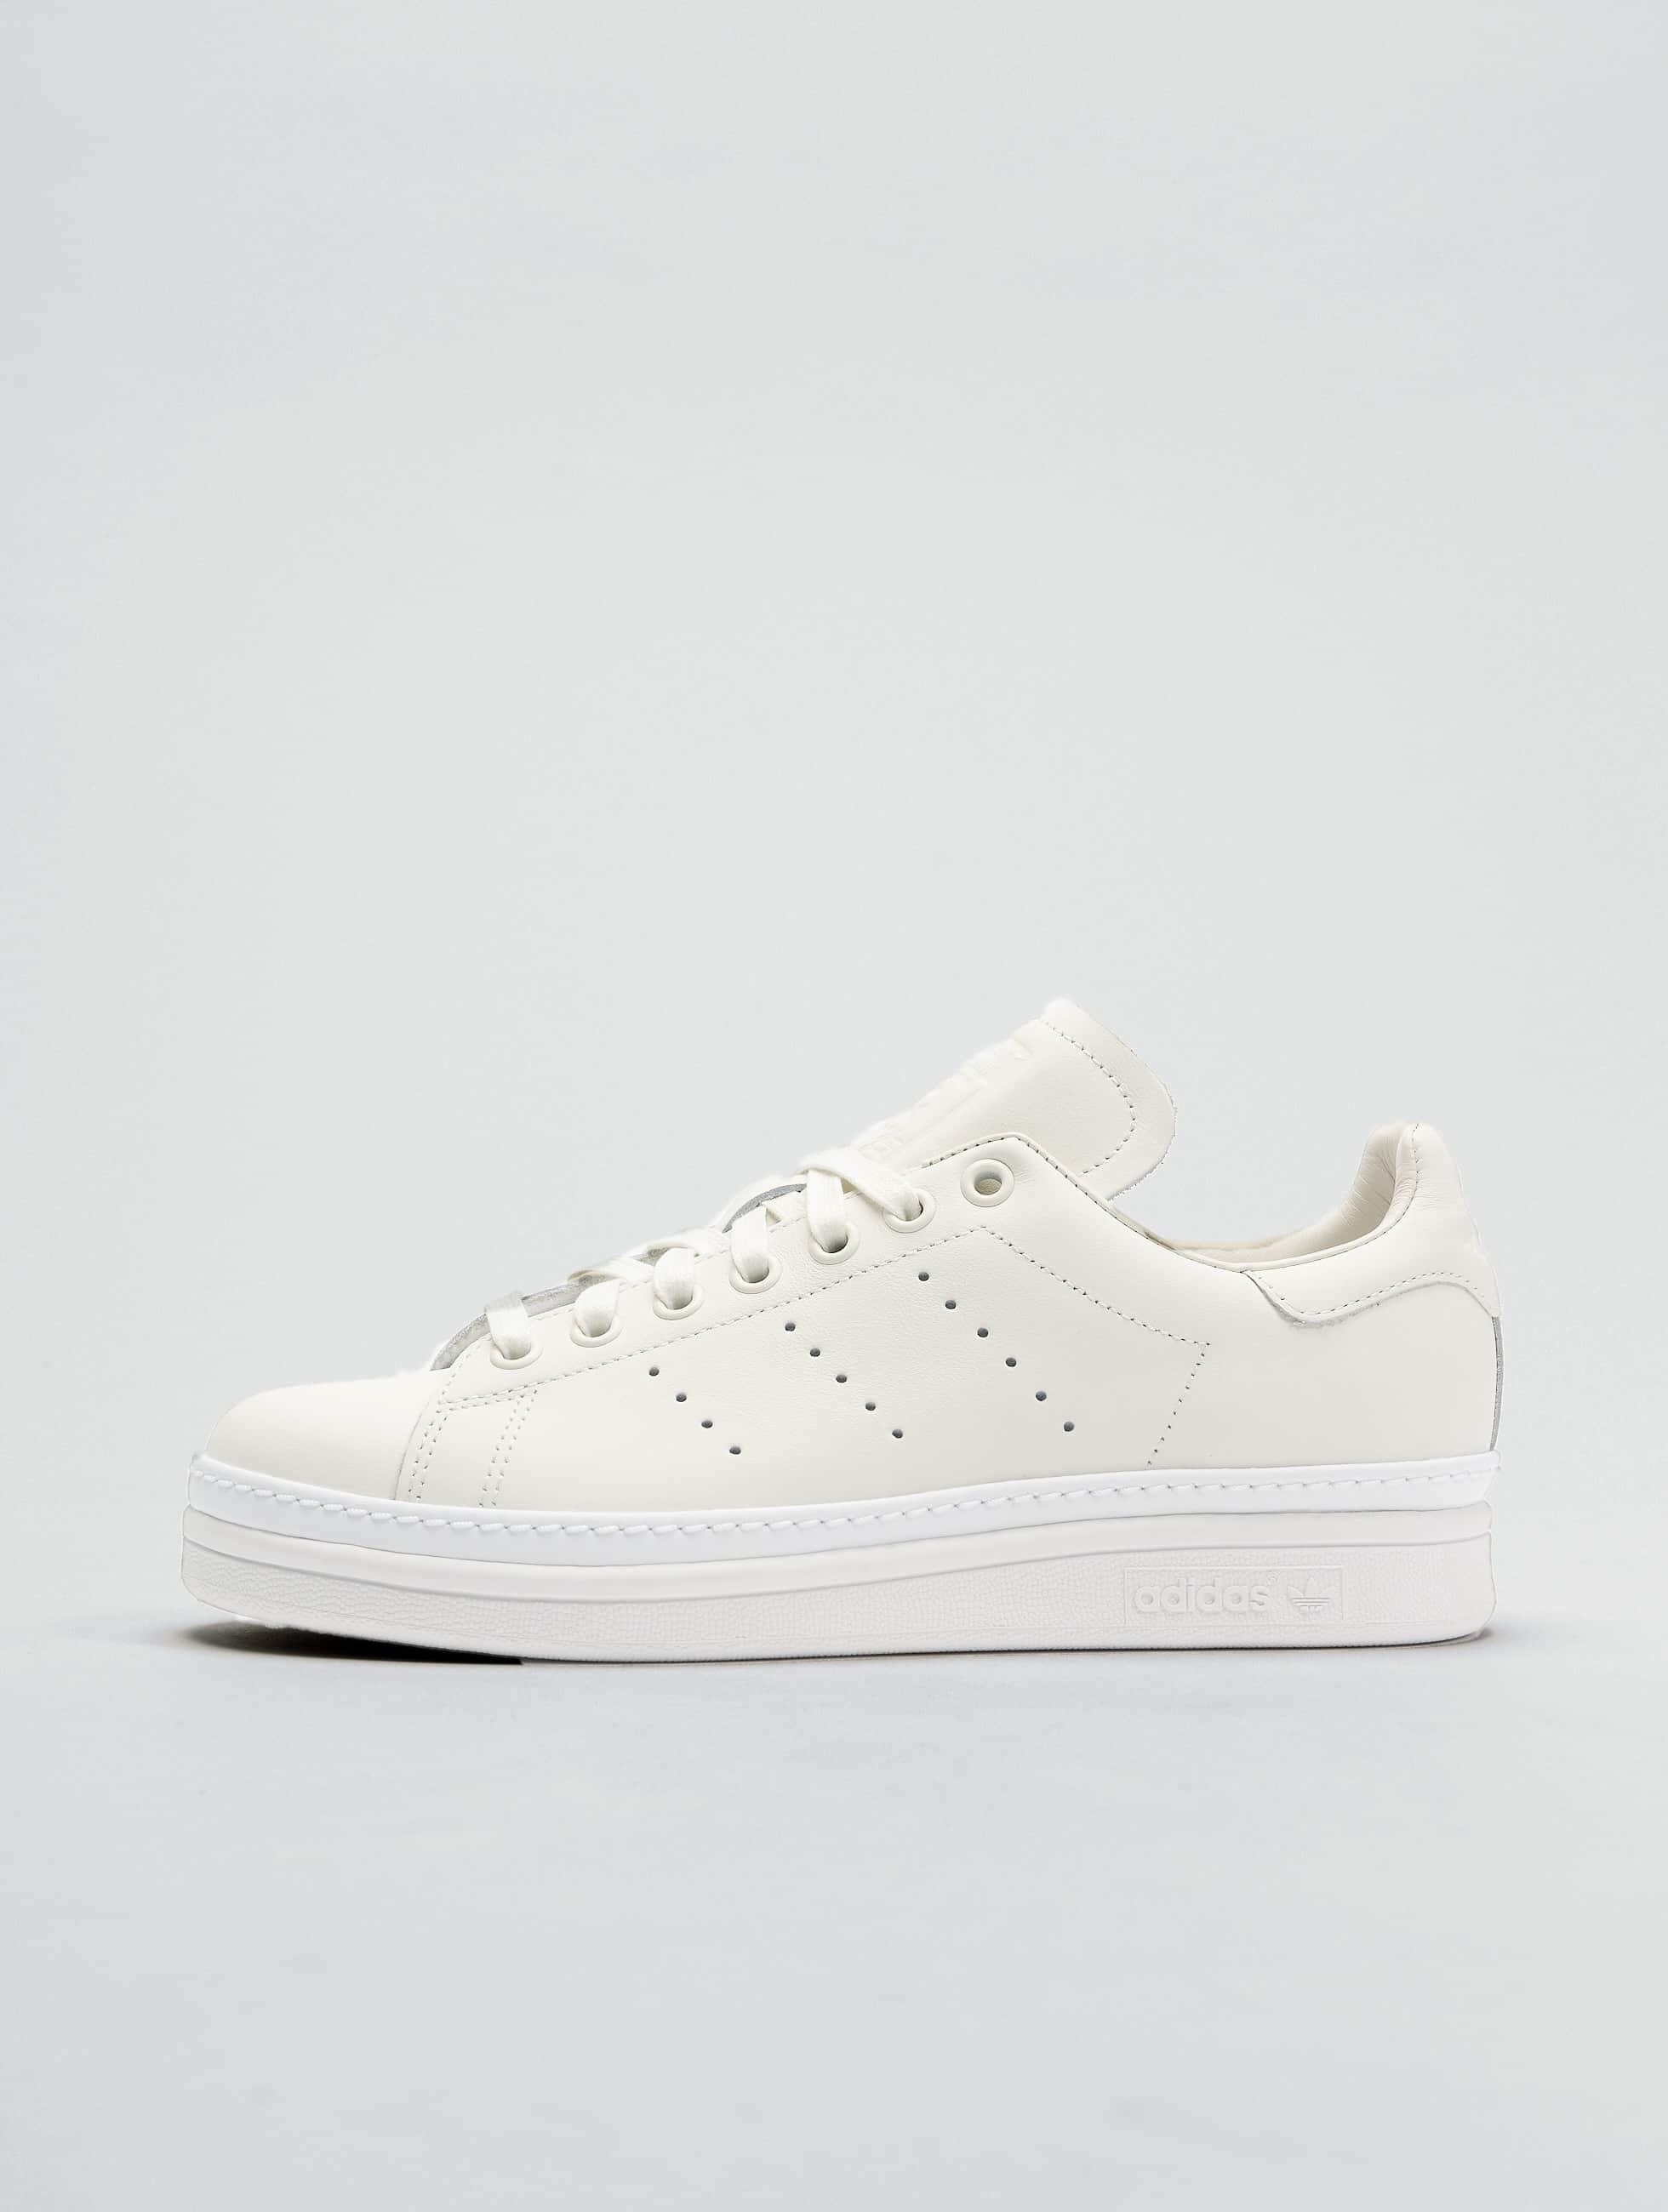 a9463370f65d8 adidas originals | Stan Smith New Bold blanc Femme Baskets 498400